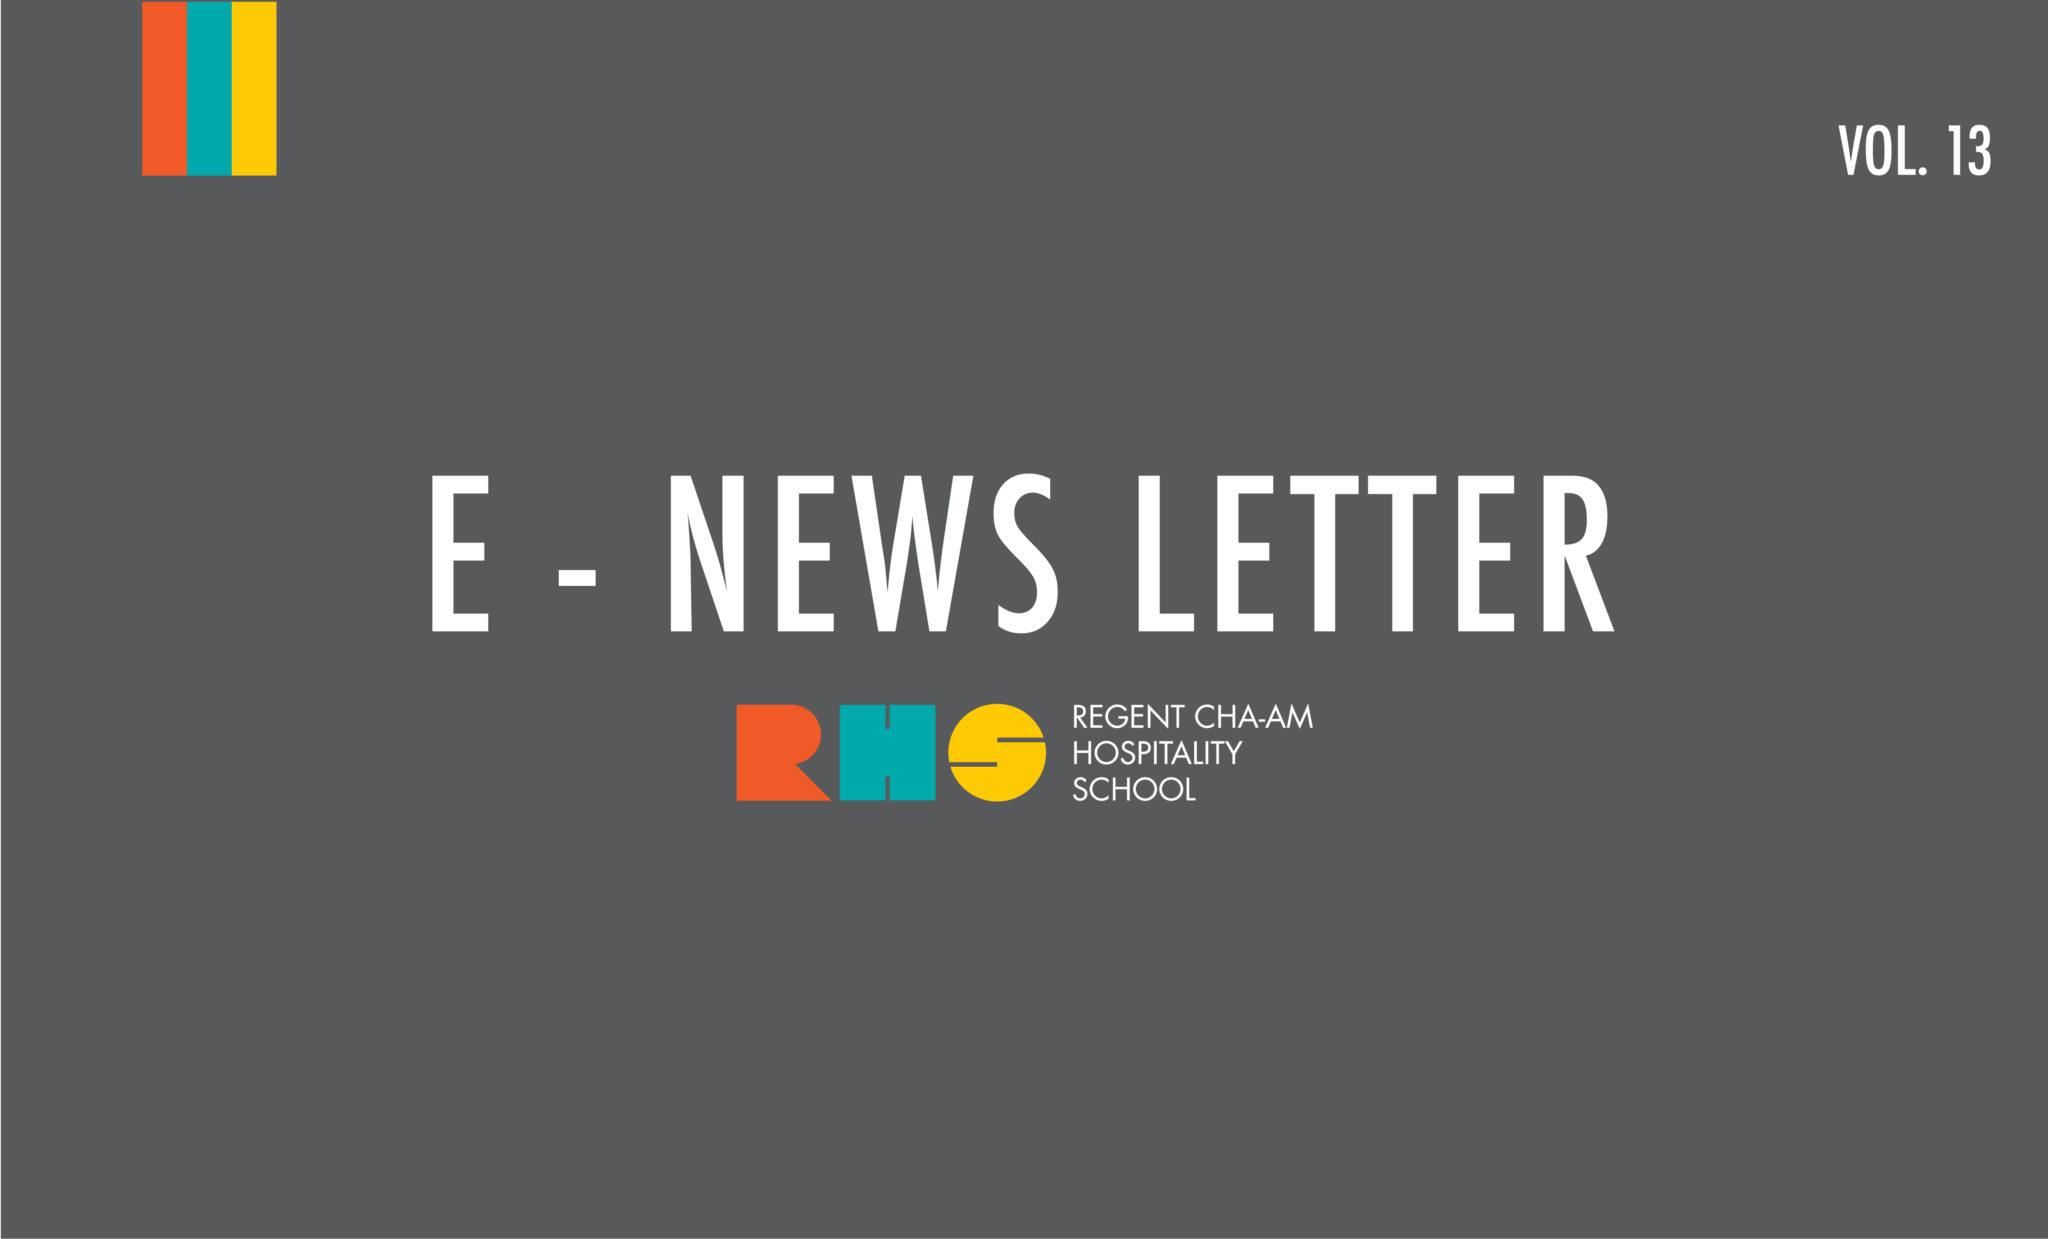 RHS News Letter Volume 13